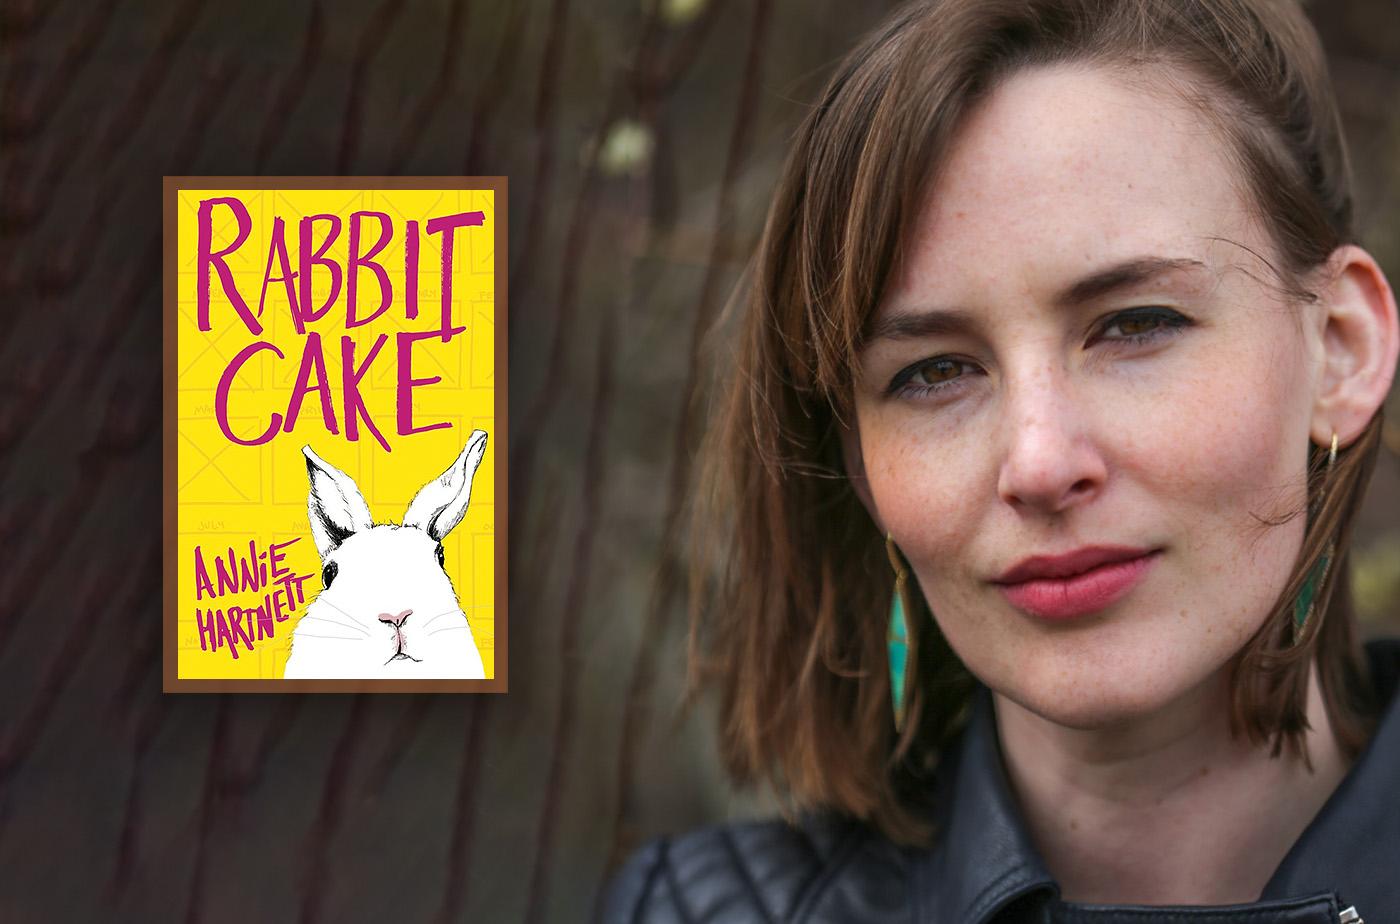 Catapult online classes: Annie Hartnett, 8-Week Online Fiction Workshop: Making Scene-by-Scene Progress on Your Novel, Novel, Fiction, Workshop